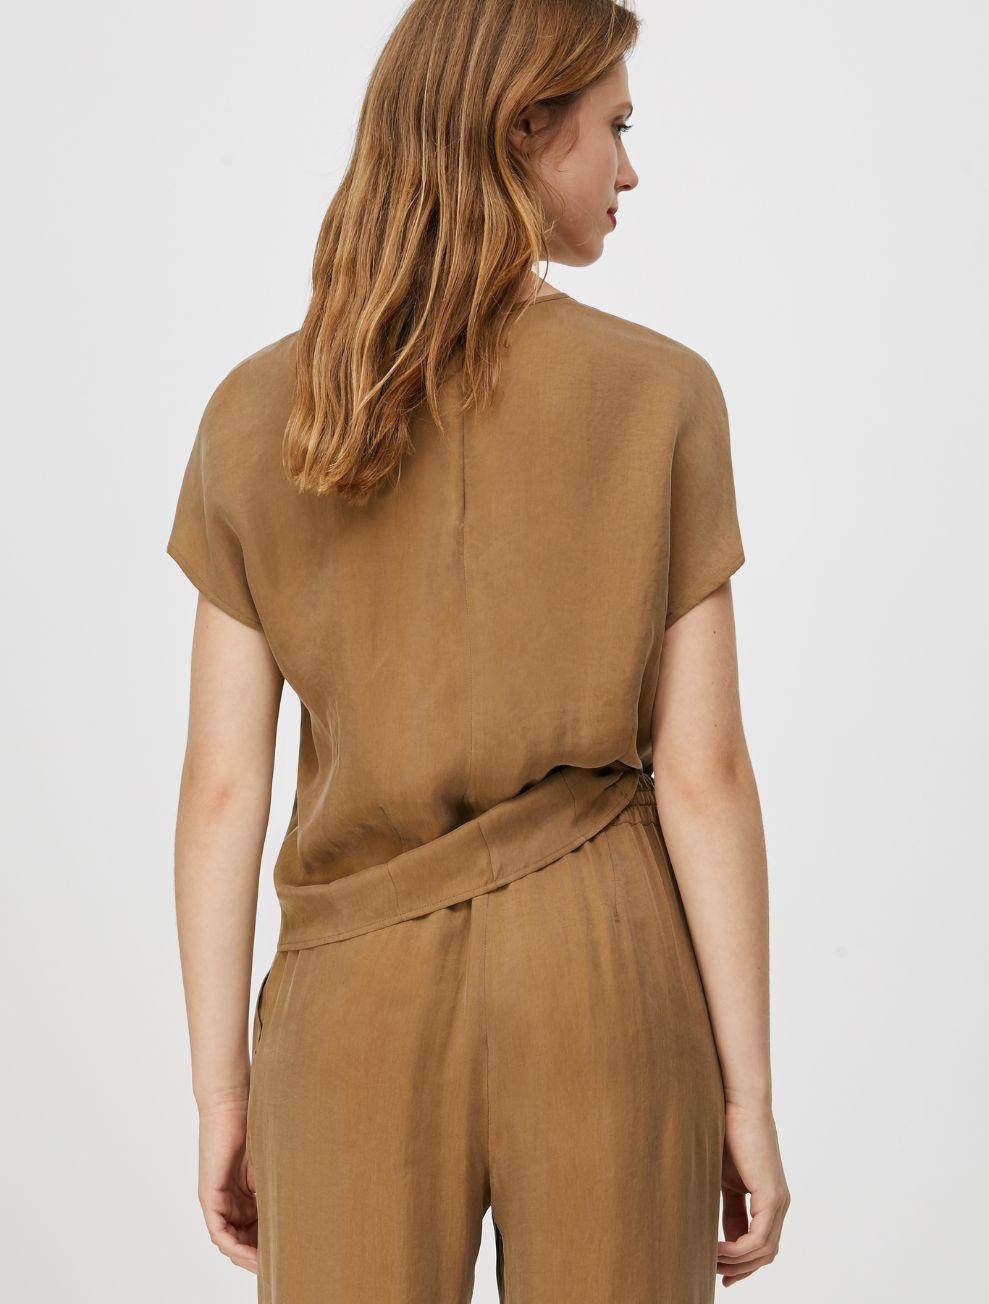 DISPUTA Shirt brown 2